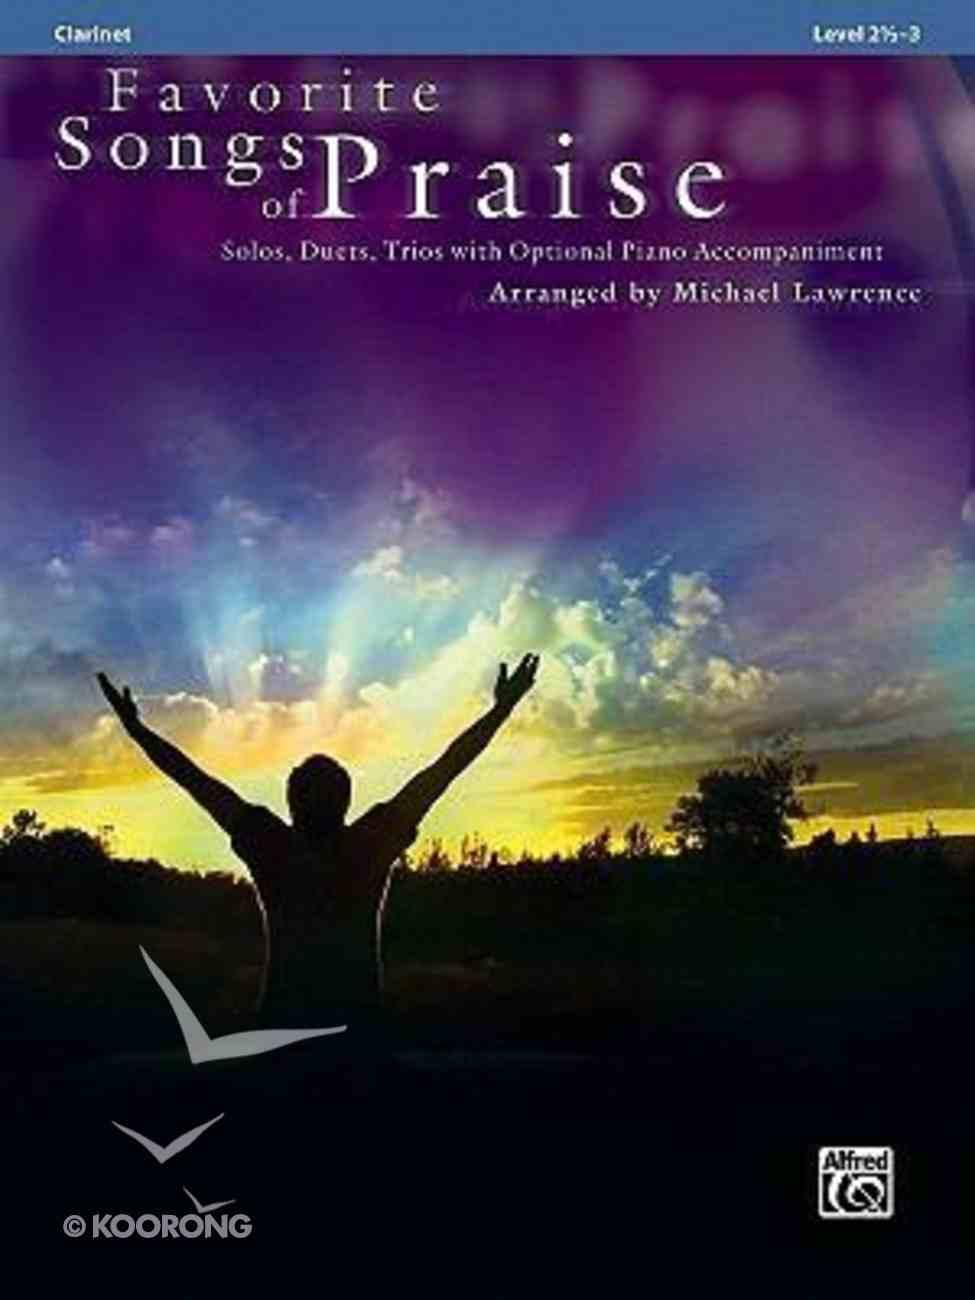 Favortite Songs of Praise (Music Book) (Clarinet) Paperback